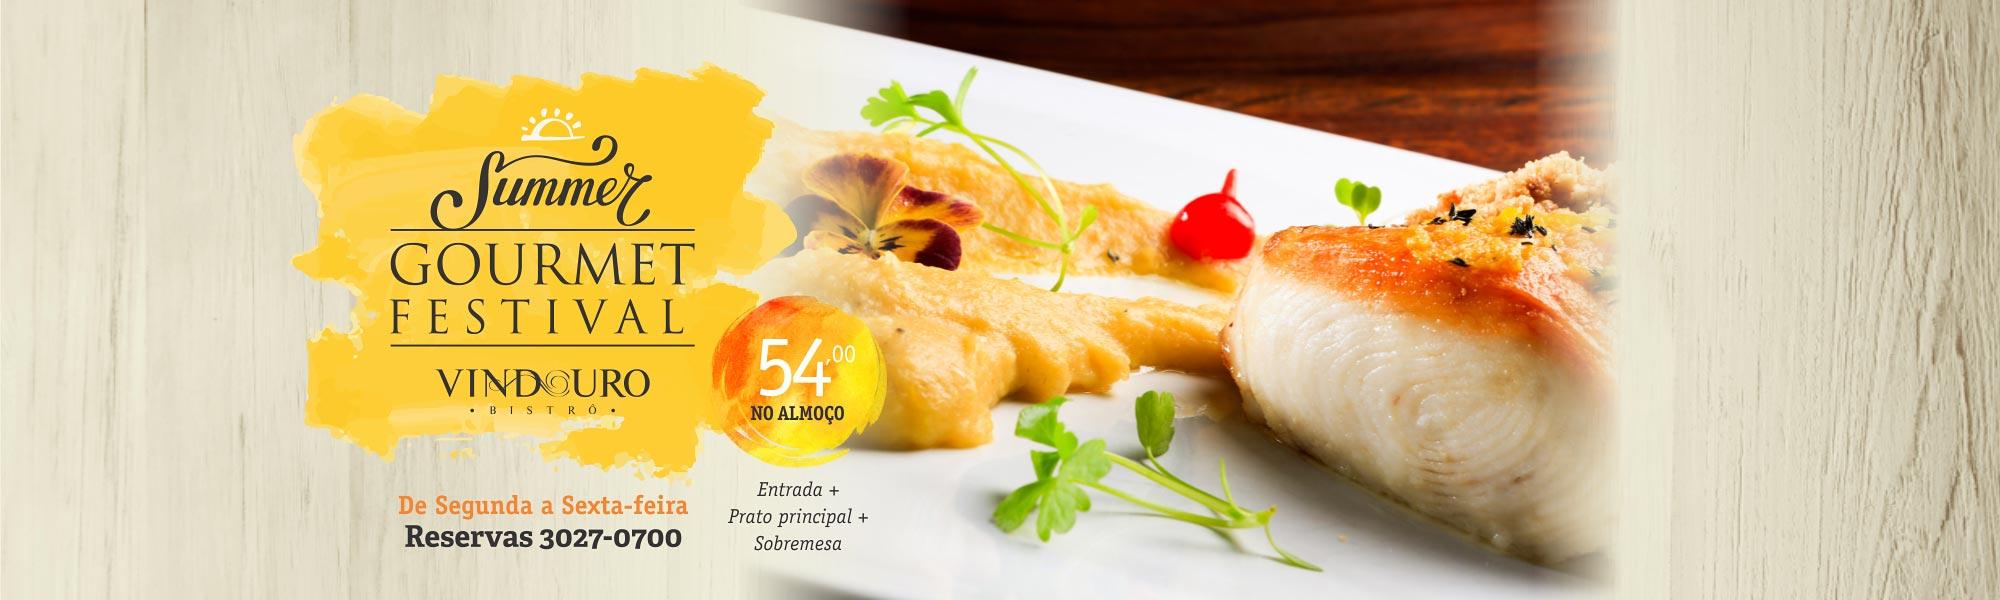 Summer Gourmet Festival Vindouro